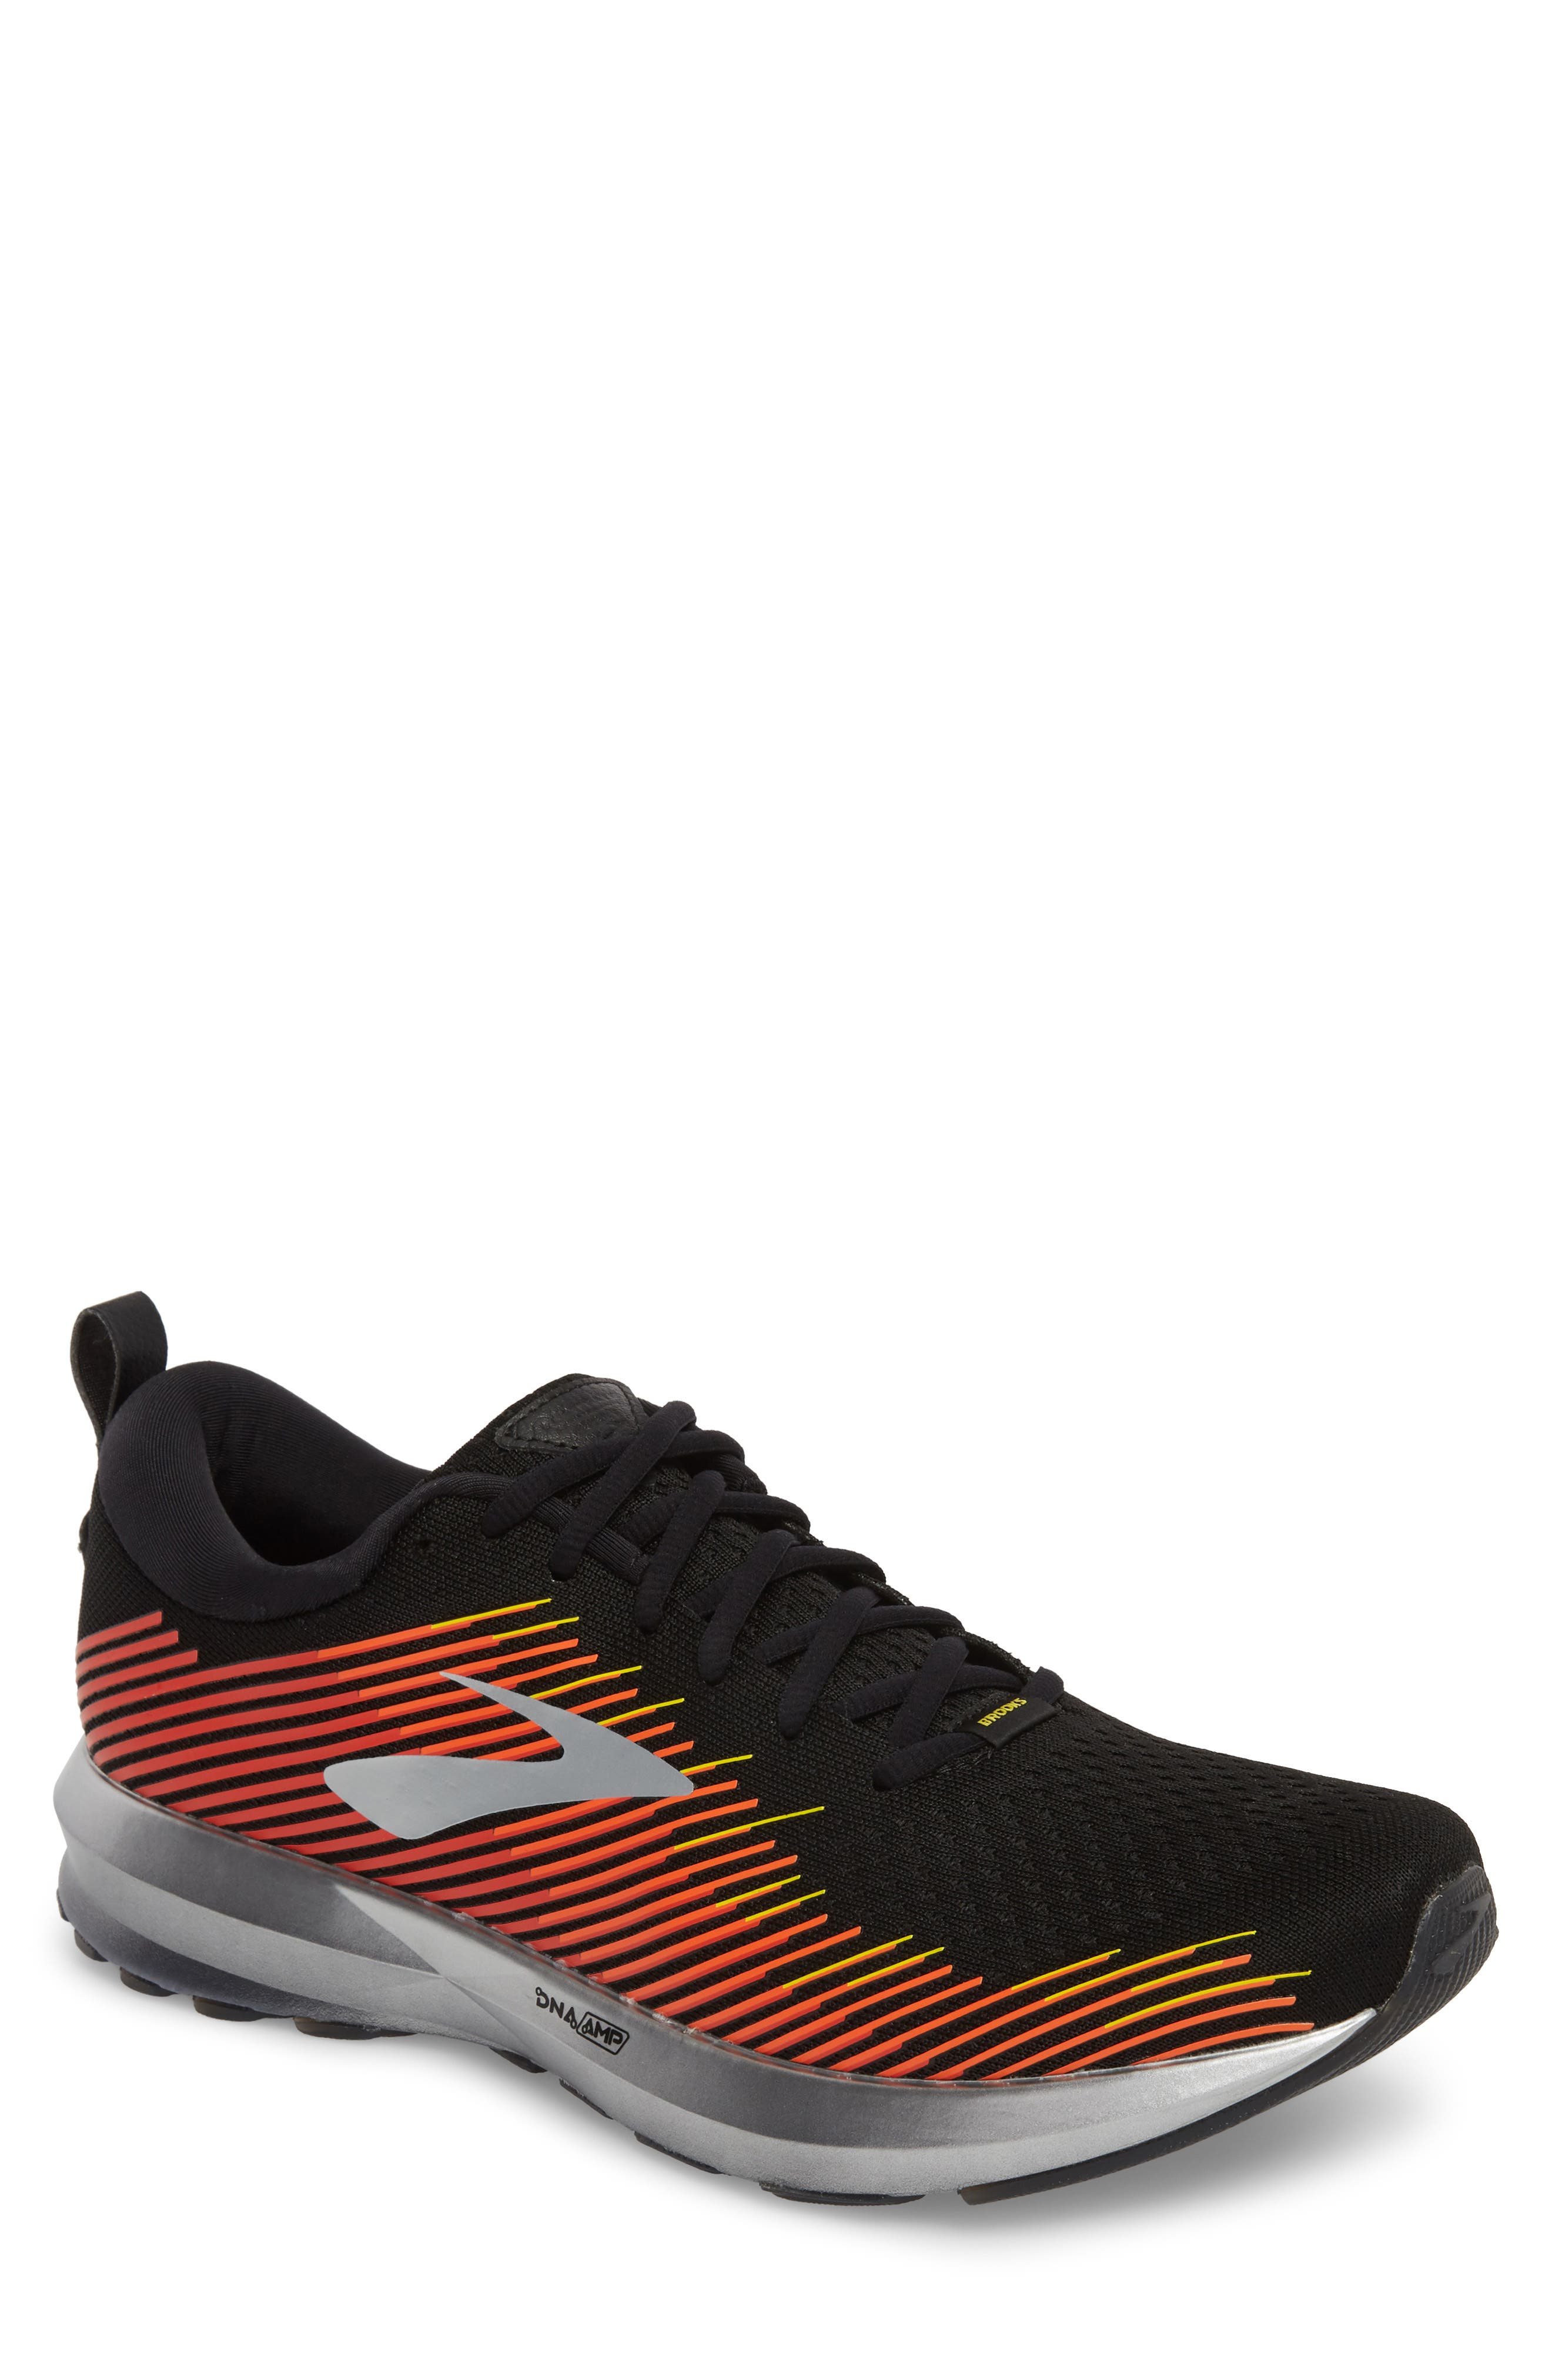 Alternate Image 1 Selected - Brooks Levitate Running Shoe (Men)